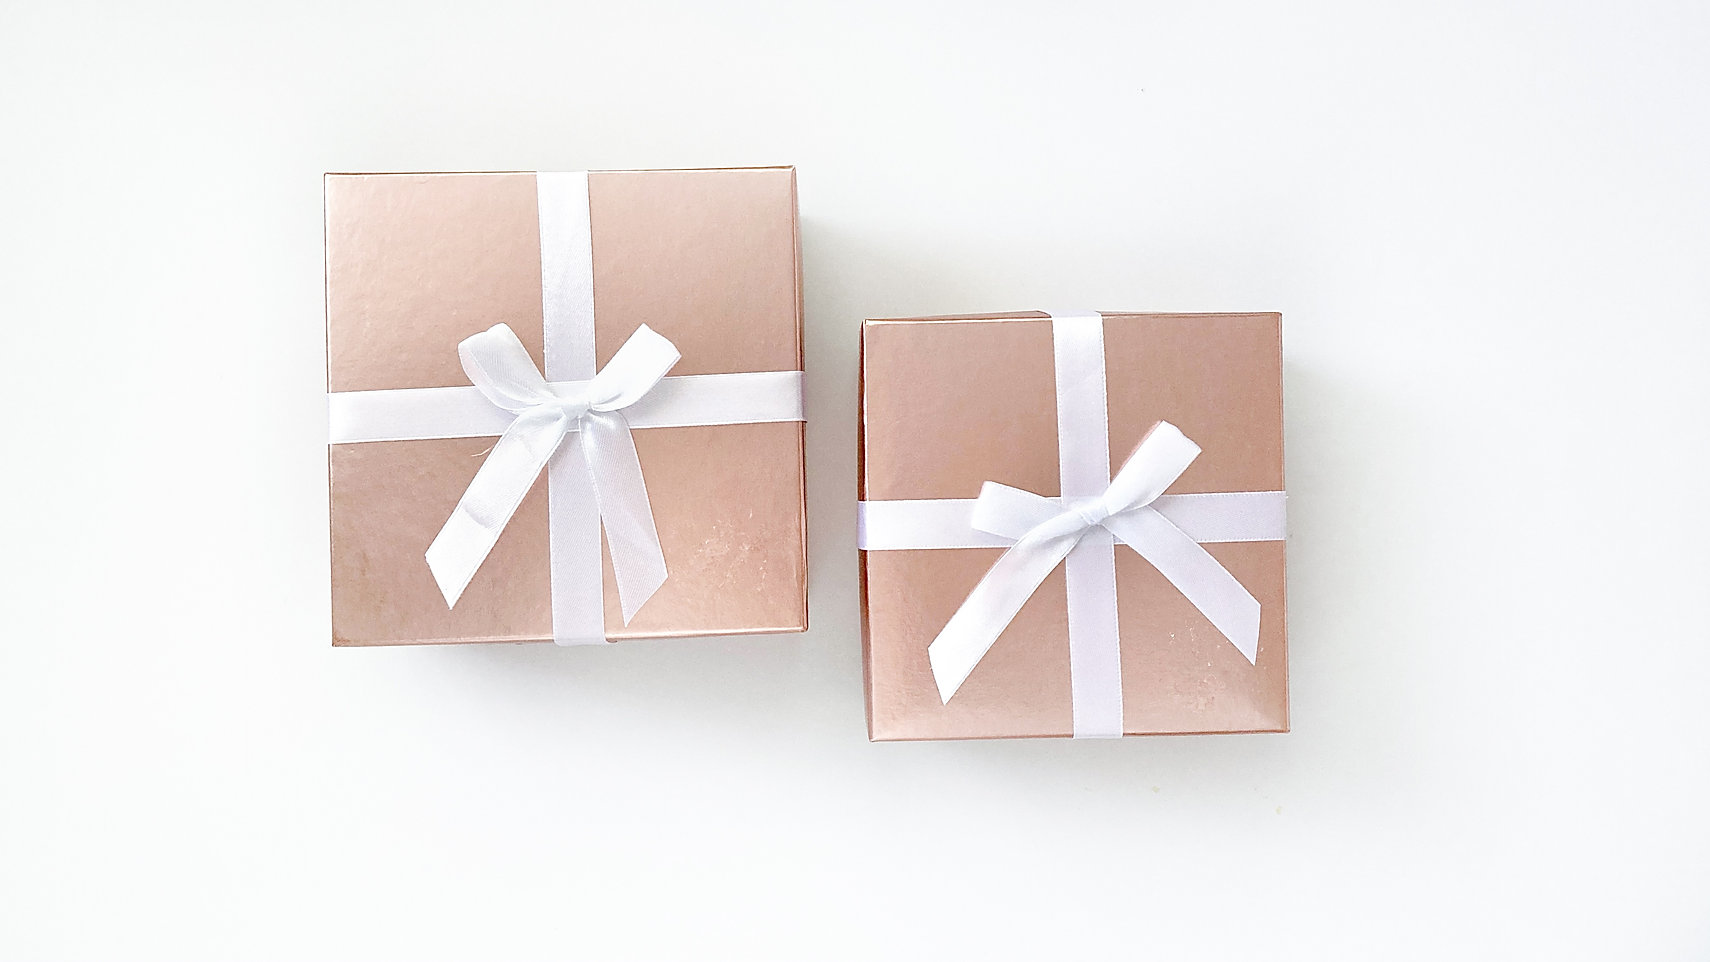 Jade Alycia Inc. Gift Guide 2020